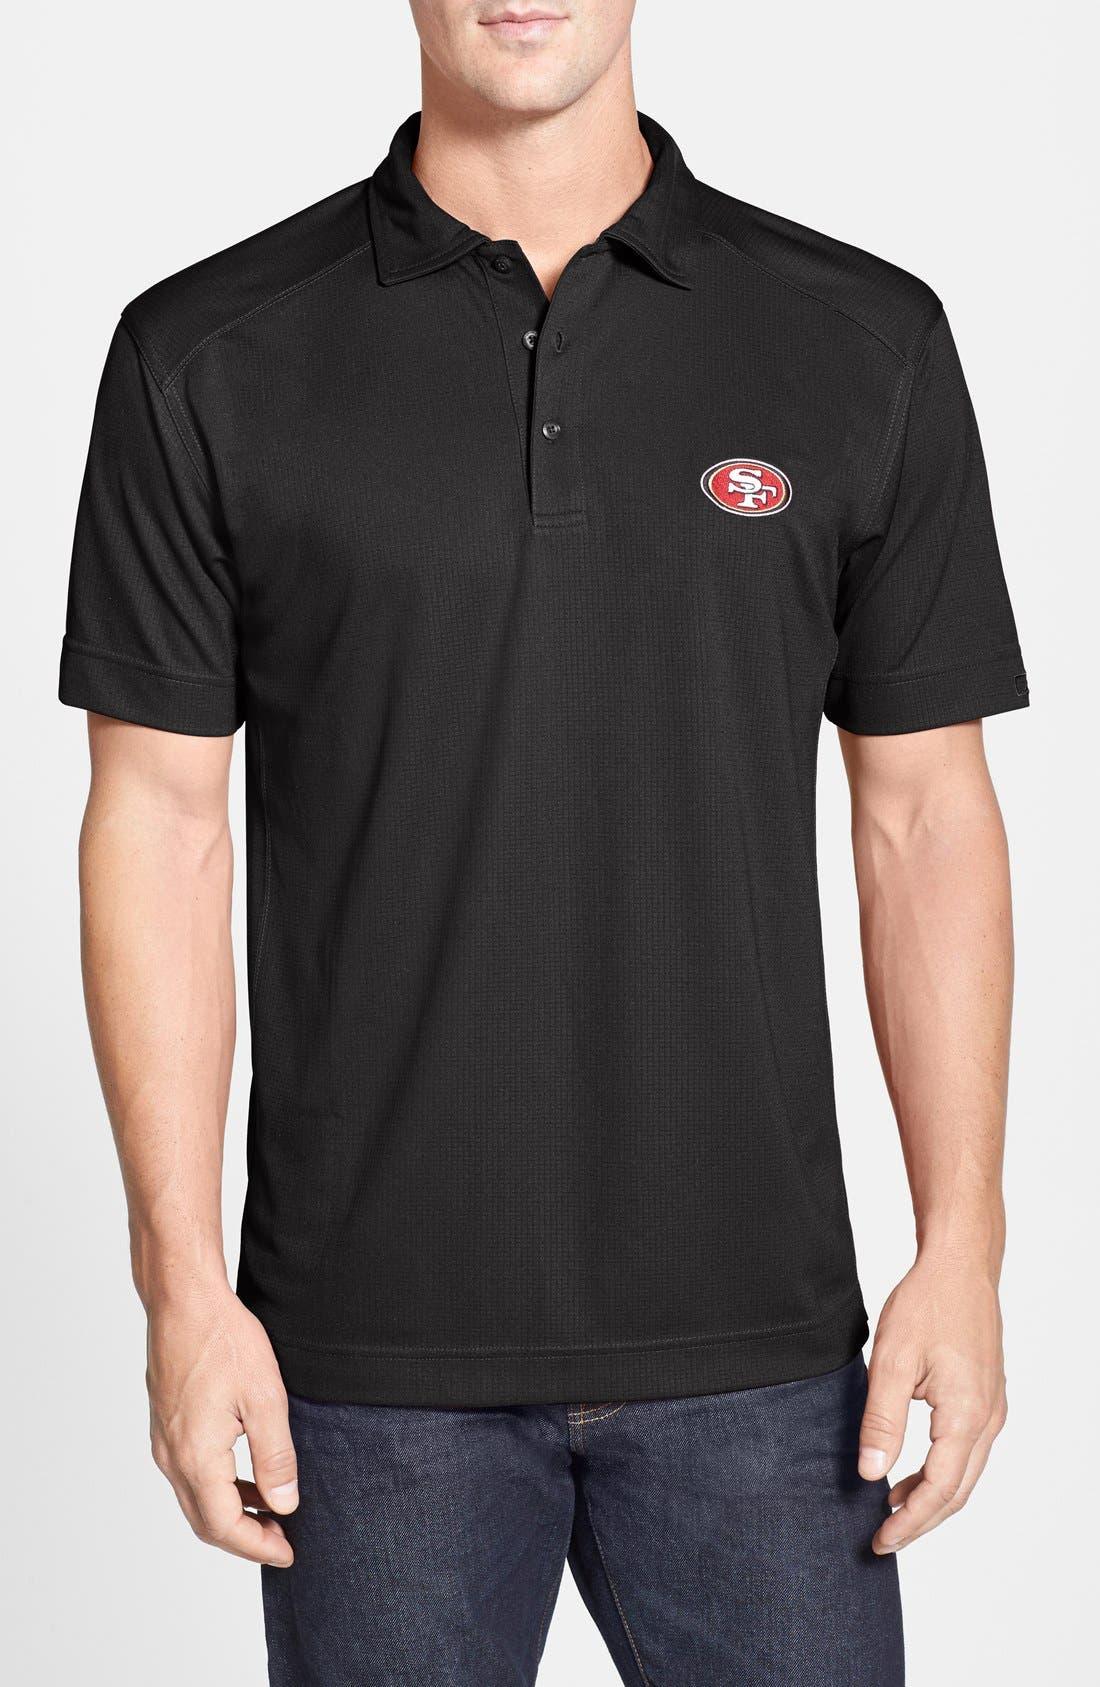 San Francisco 49ers - Genre DryTec Moisture Wicking Polo,                         Main,                         color, 001